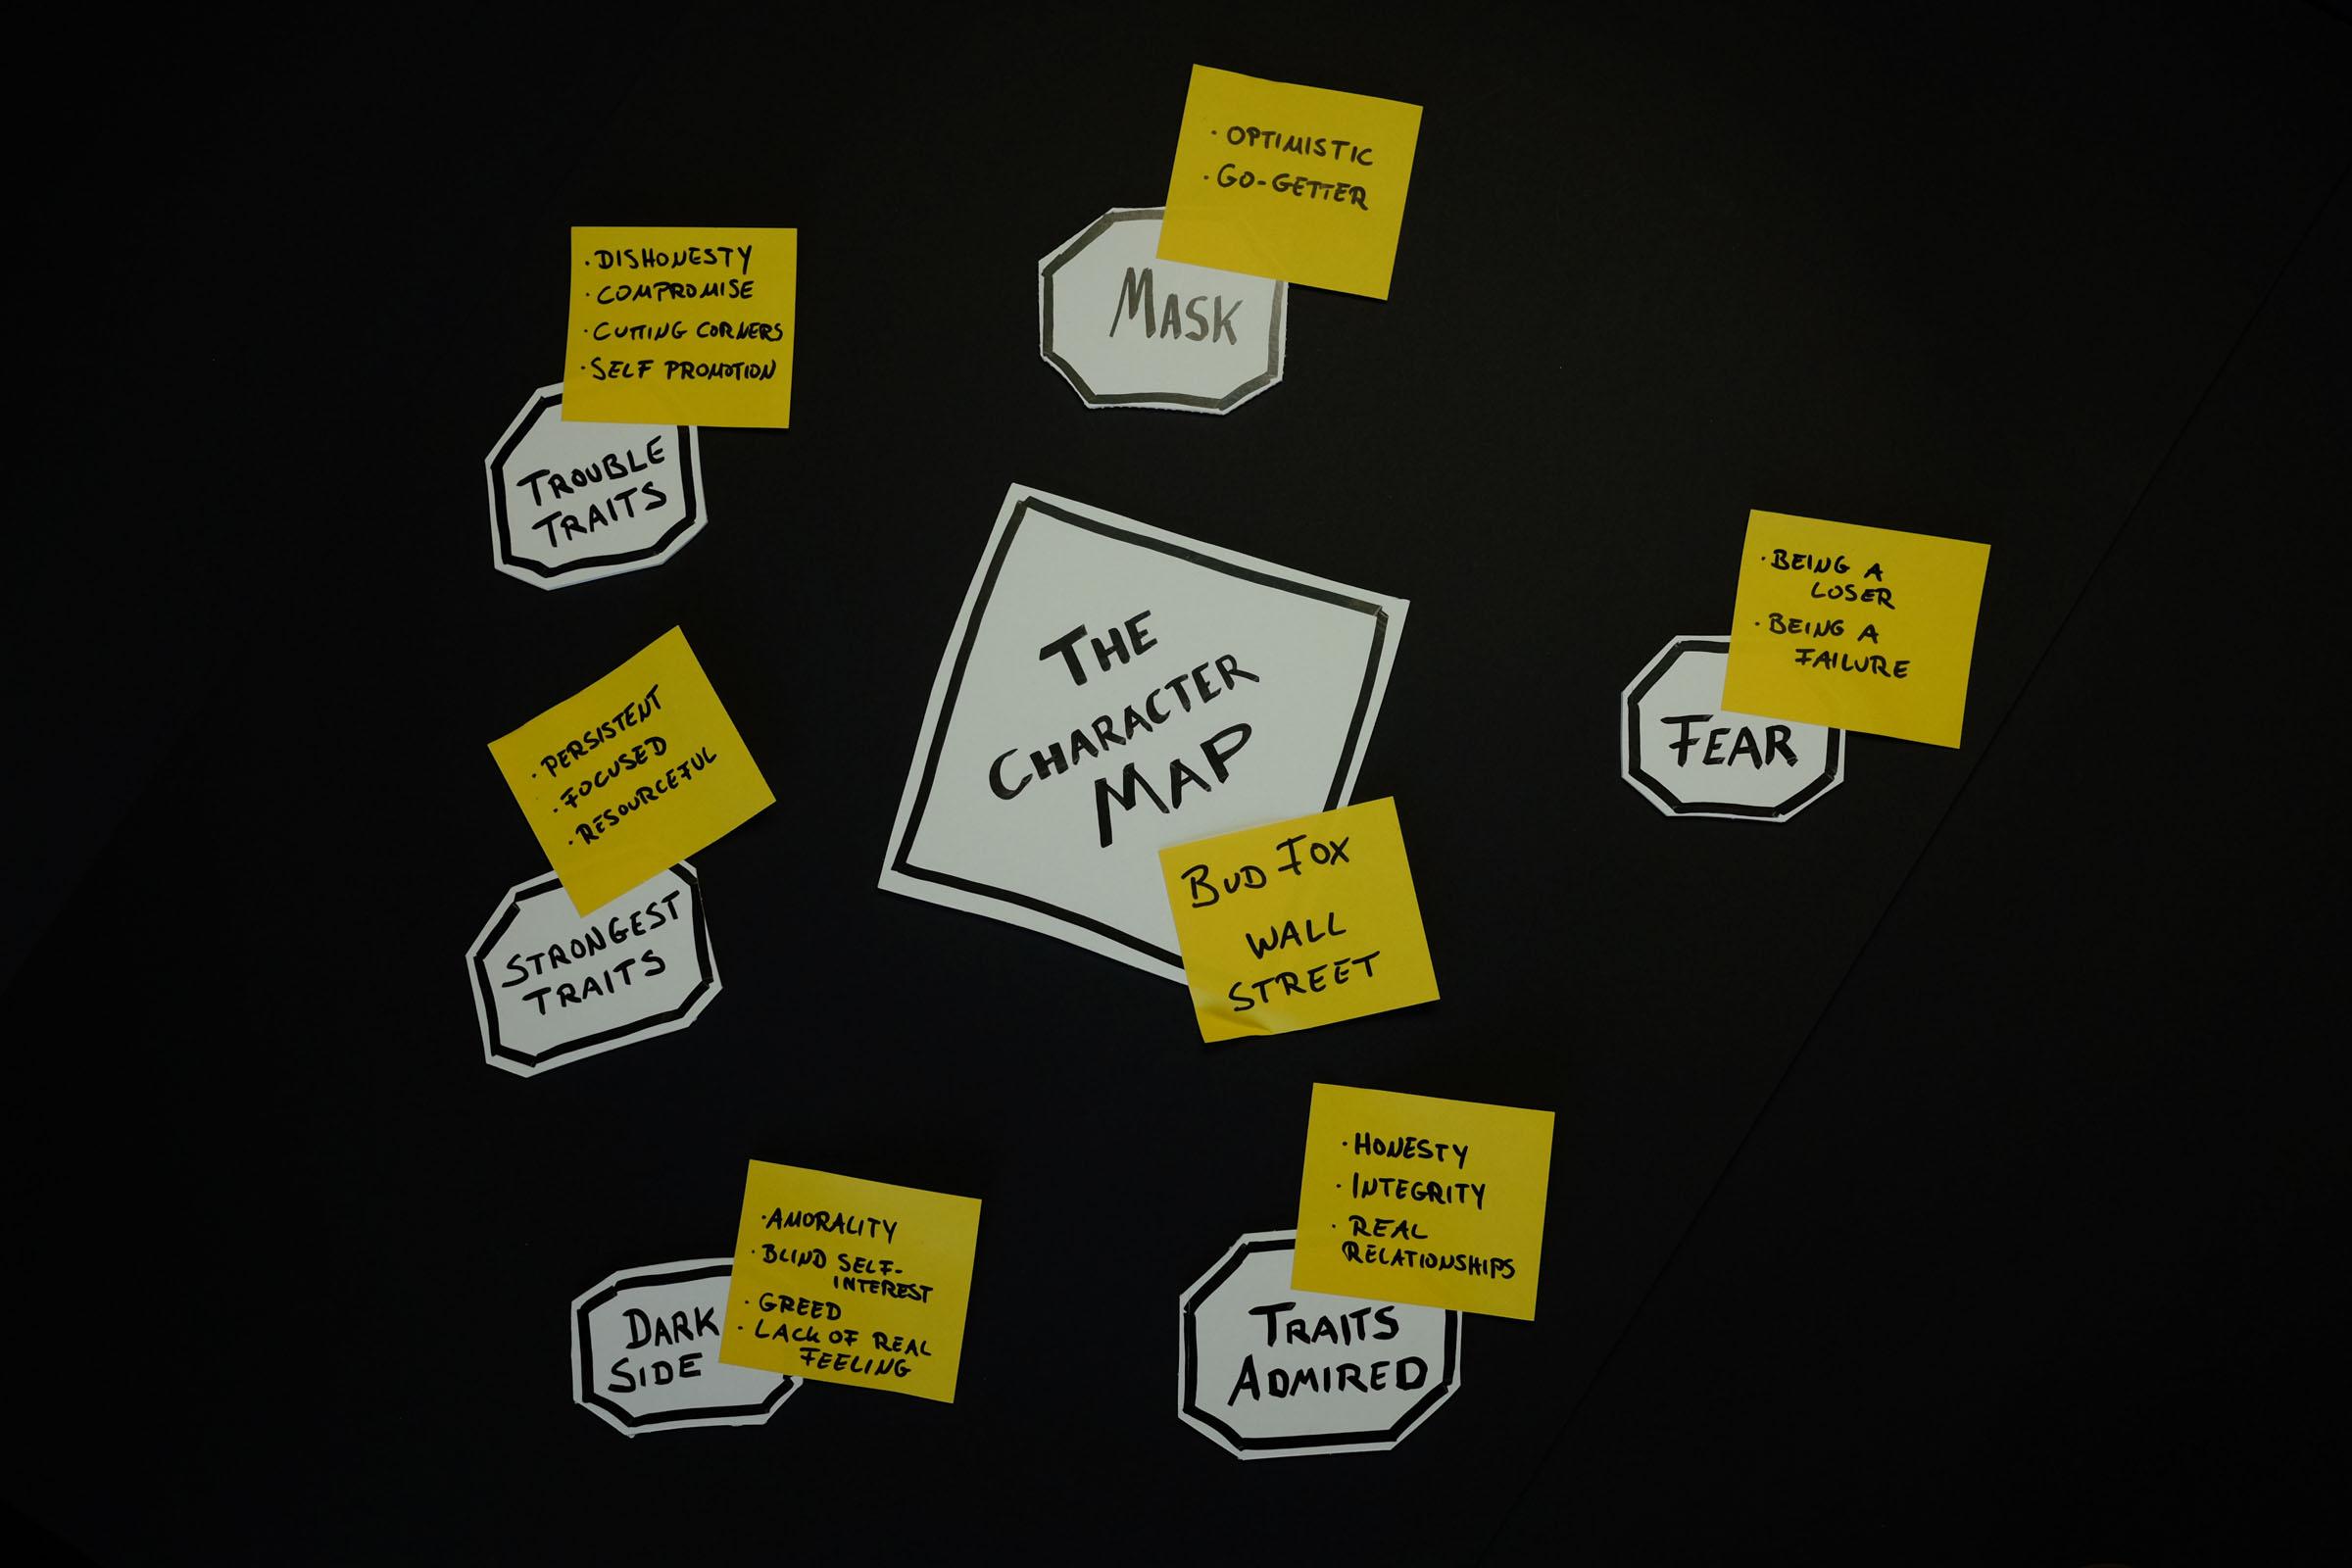 Xy Einzelfall Karte.Storytelling Tool Character Map Als Strategie Werkzeug